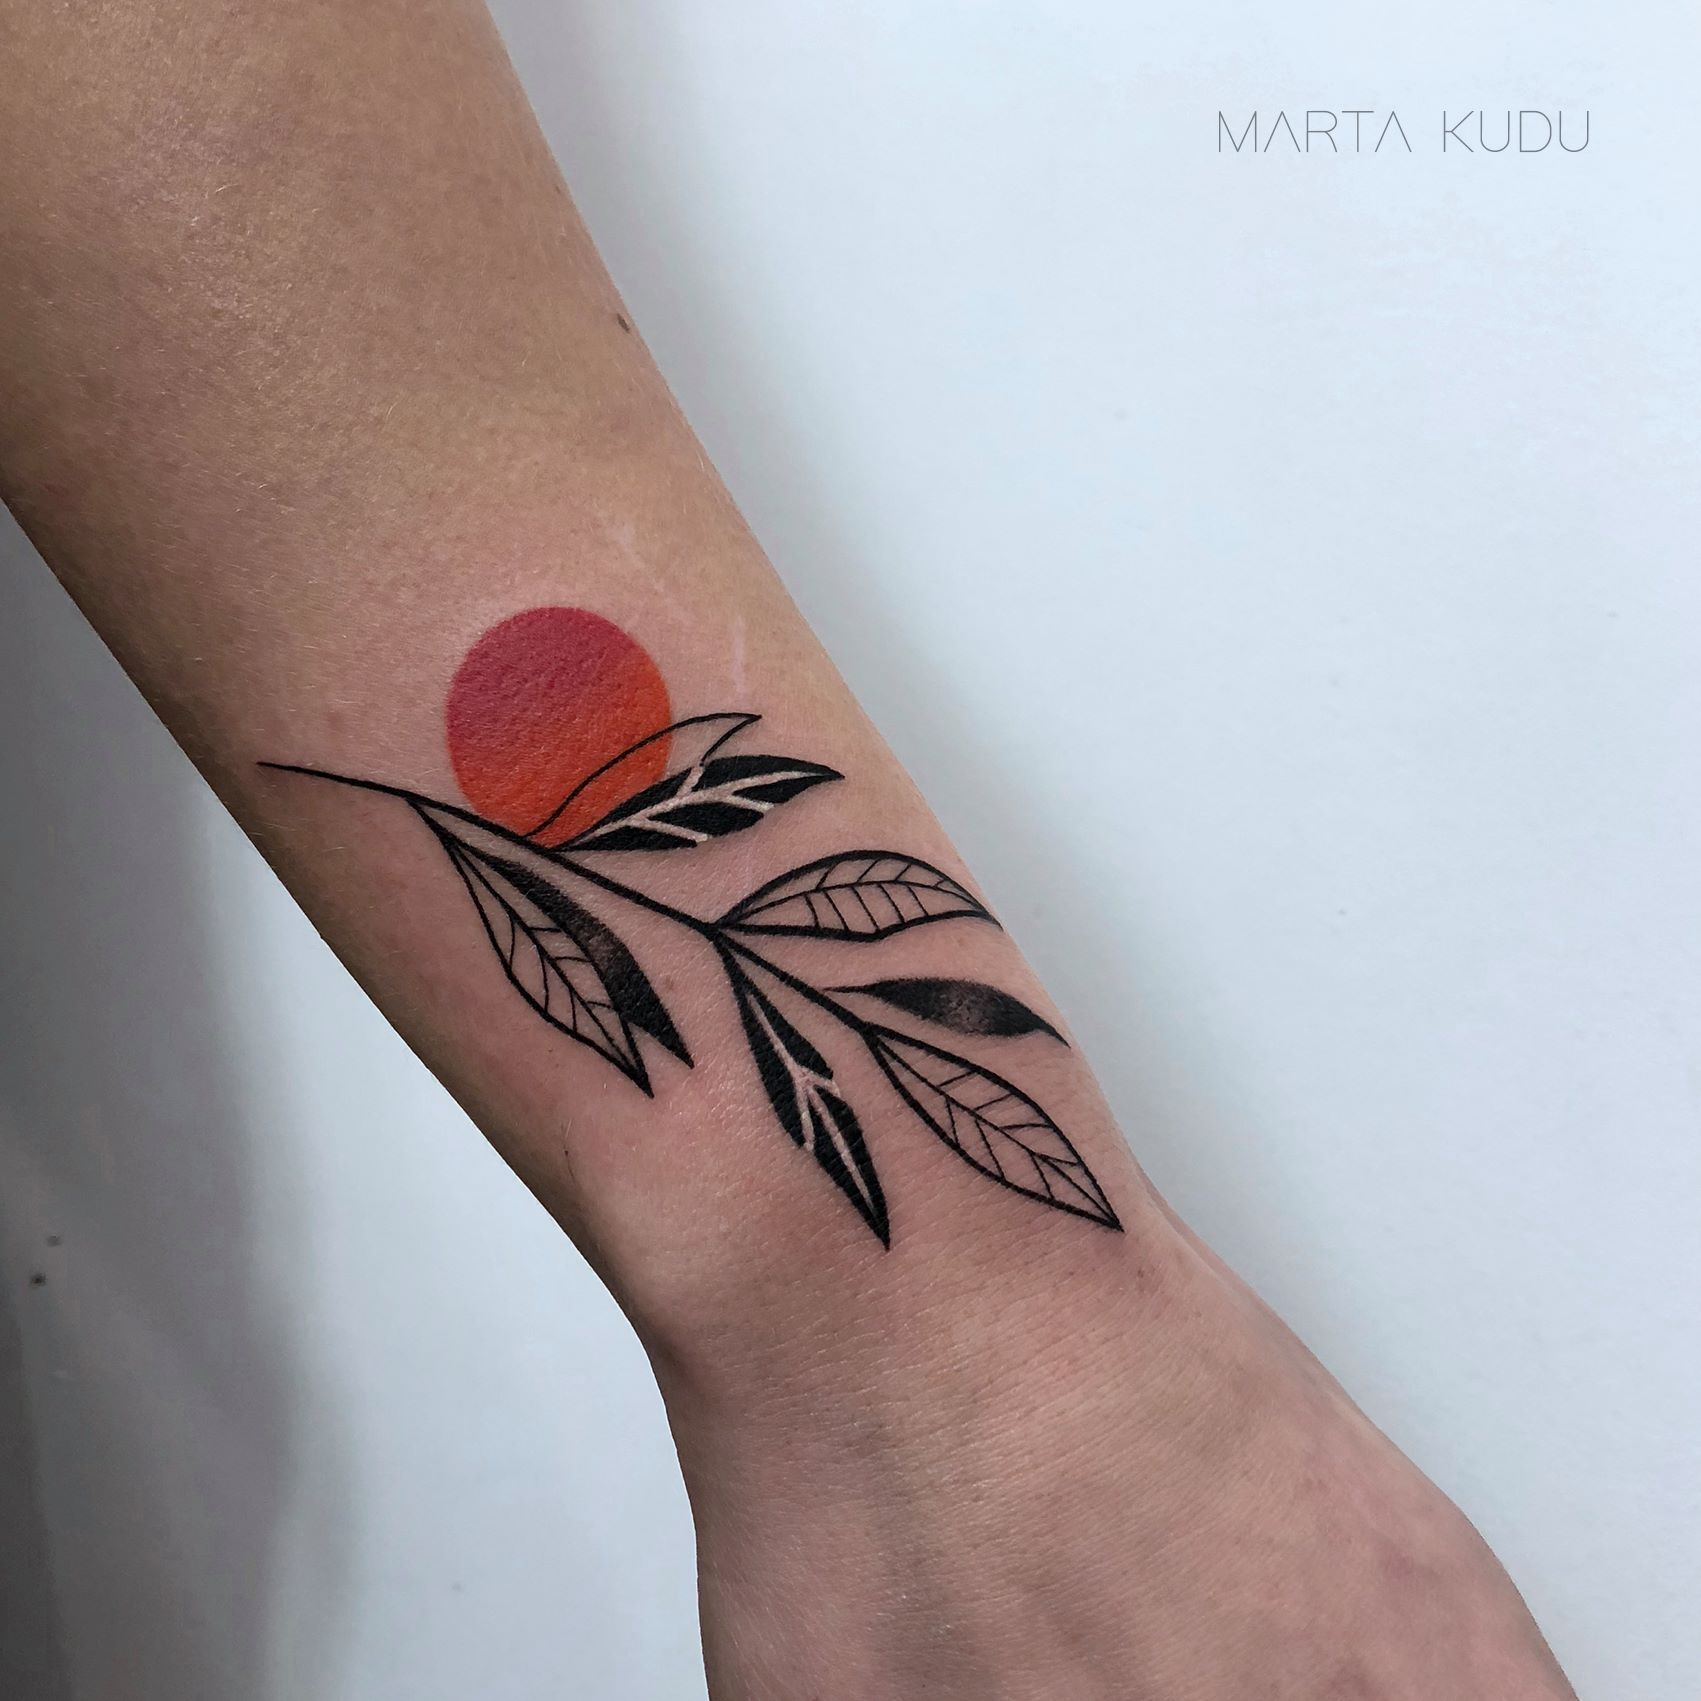 Marta Kudu - tattooer